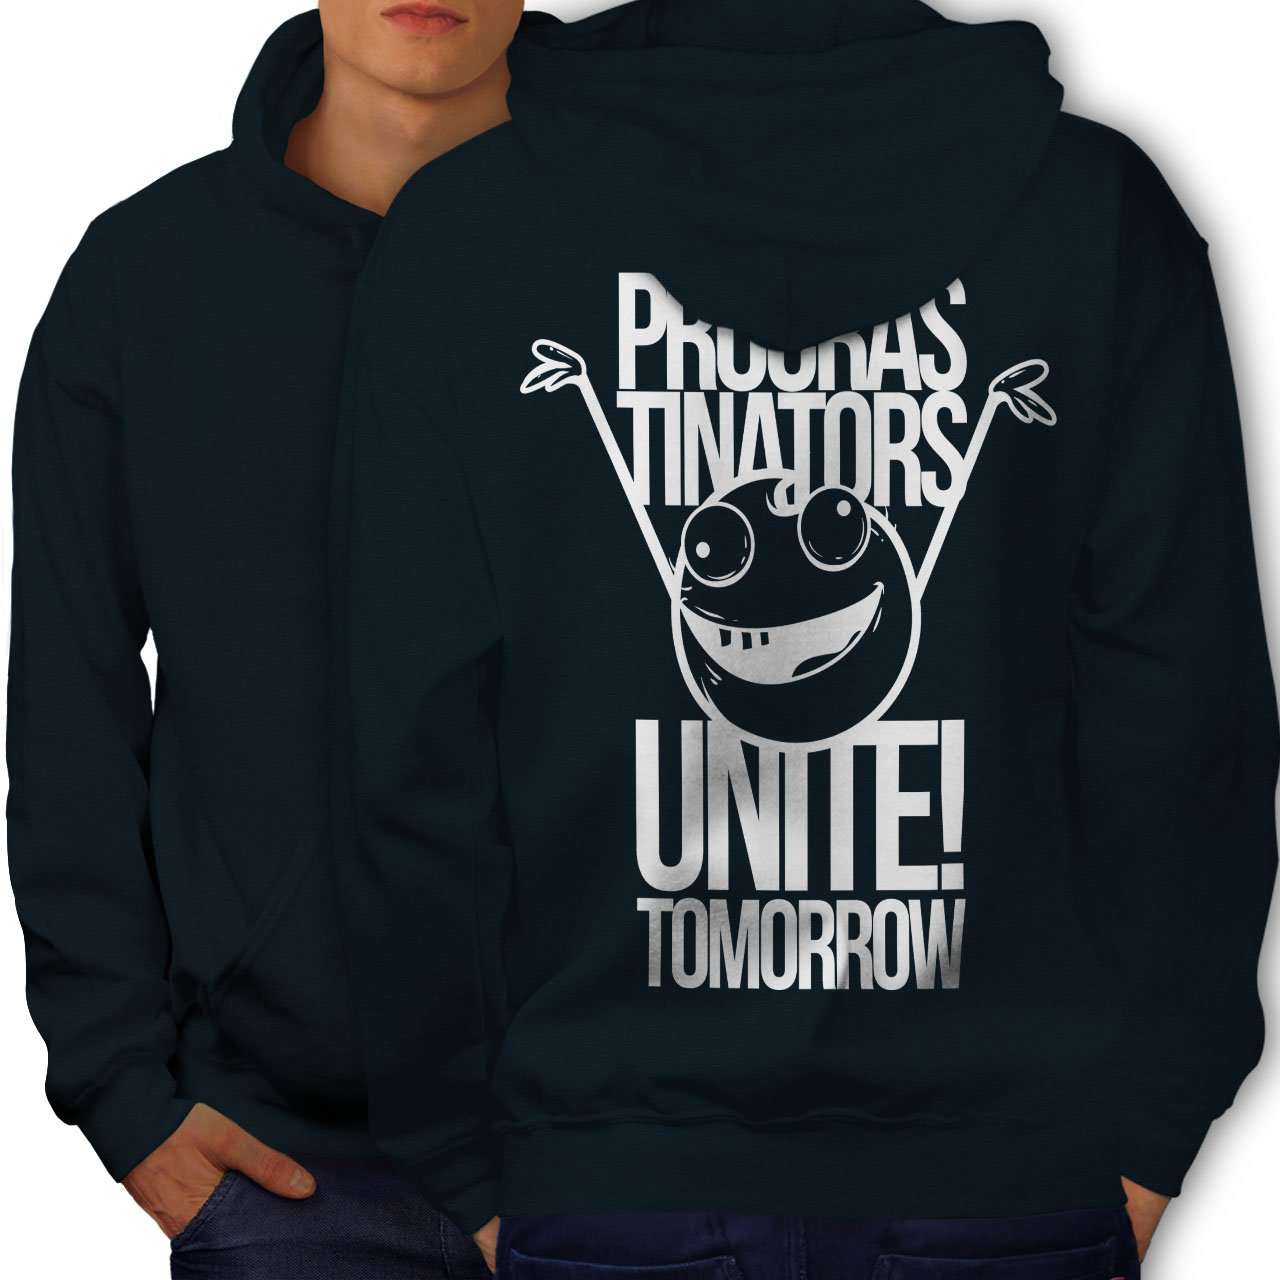 Tomorrow Printed on The Jumpers Back wellcoda Happy Smile Unite Mens Hoodie